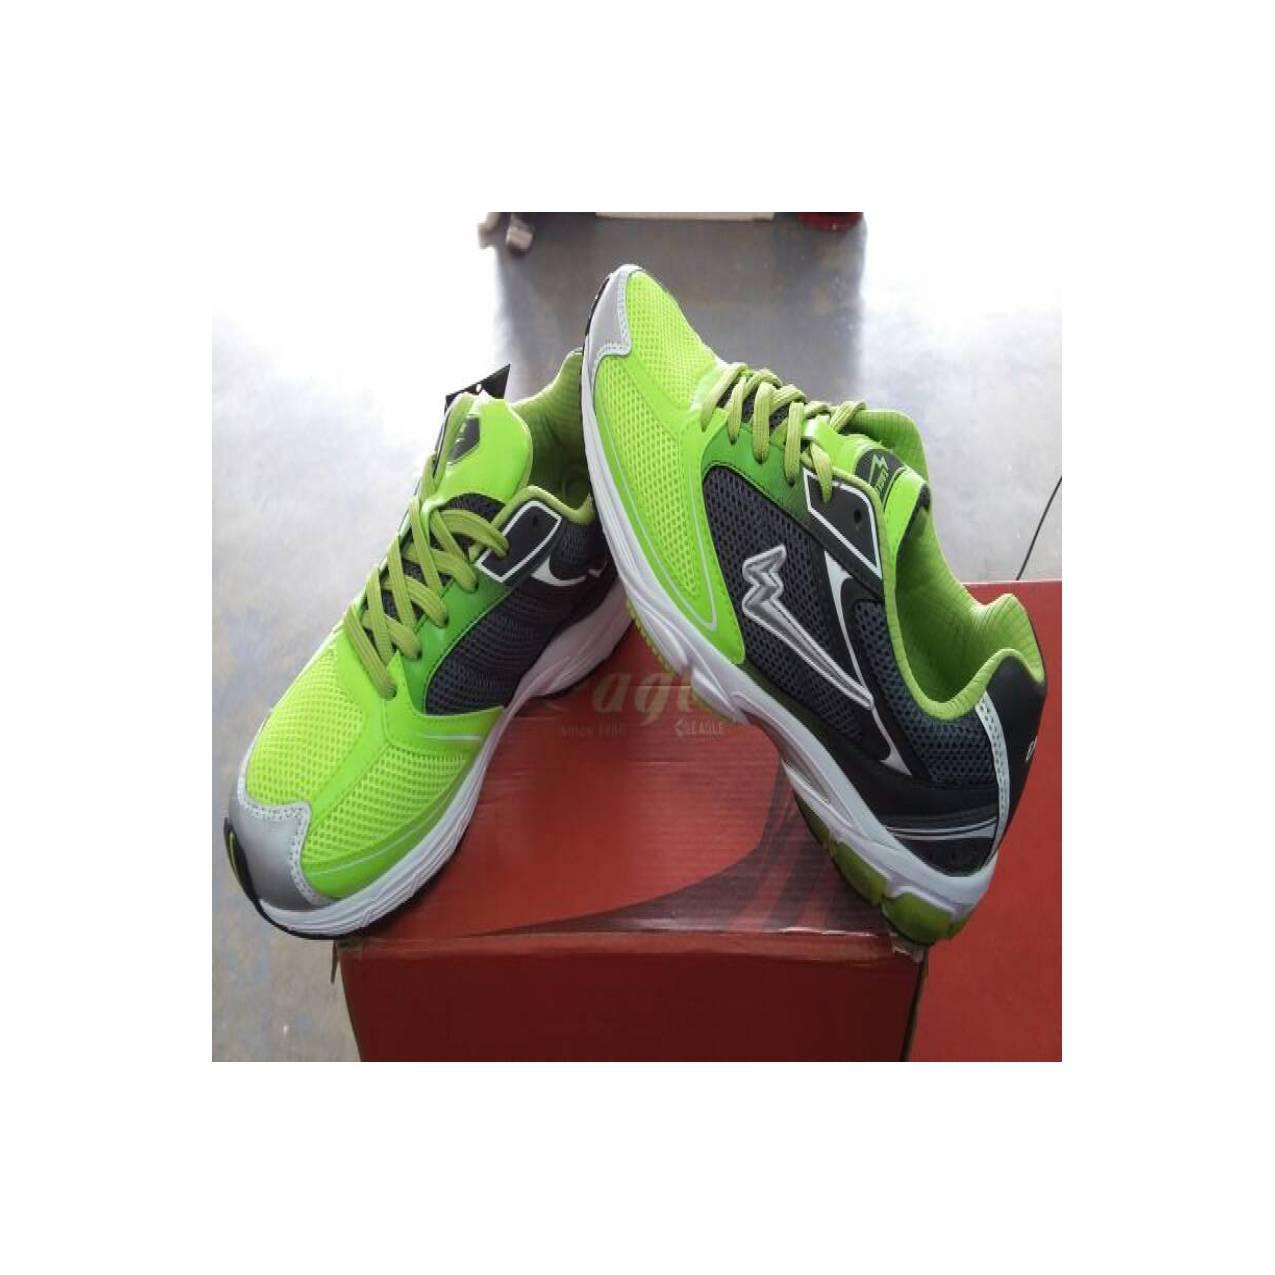 Sepatu Eagle running Royal / volly volley asics mizuno professional